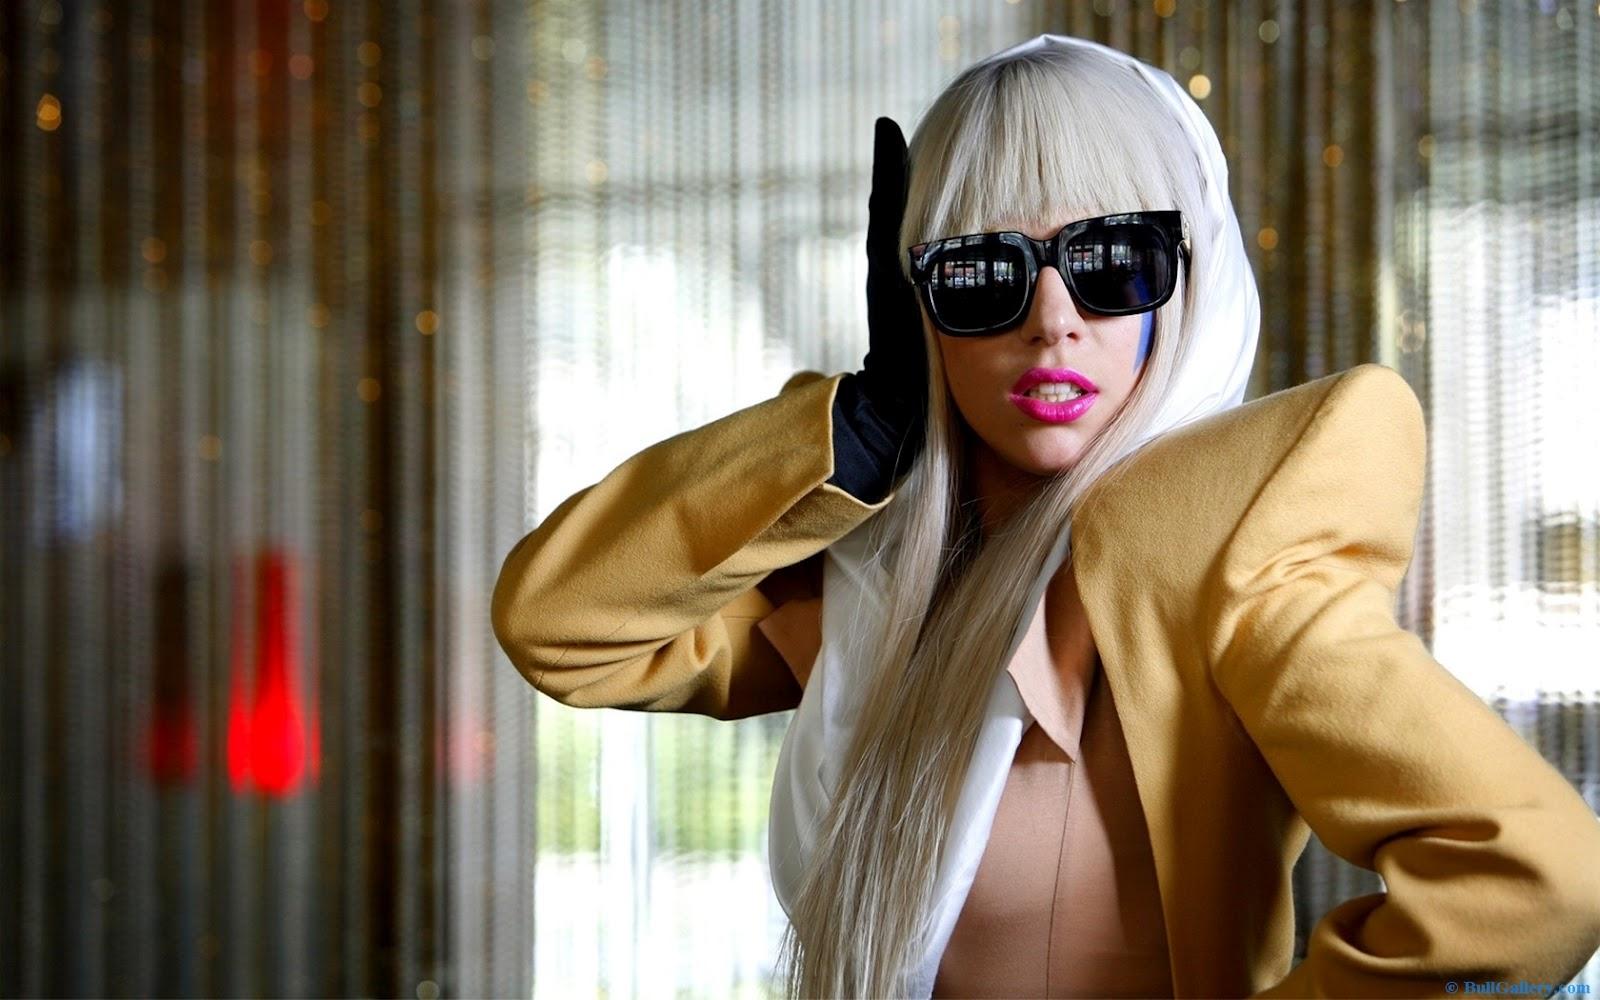 http://3.bp.blogspot.com/-JyyEBvRDdug/UGK2BcylY4I/AAAAAAAAEss/NNx6rnCsEWM/s1600/Lady-Gaga-Glasses.jpg